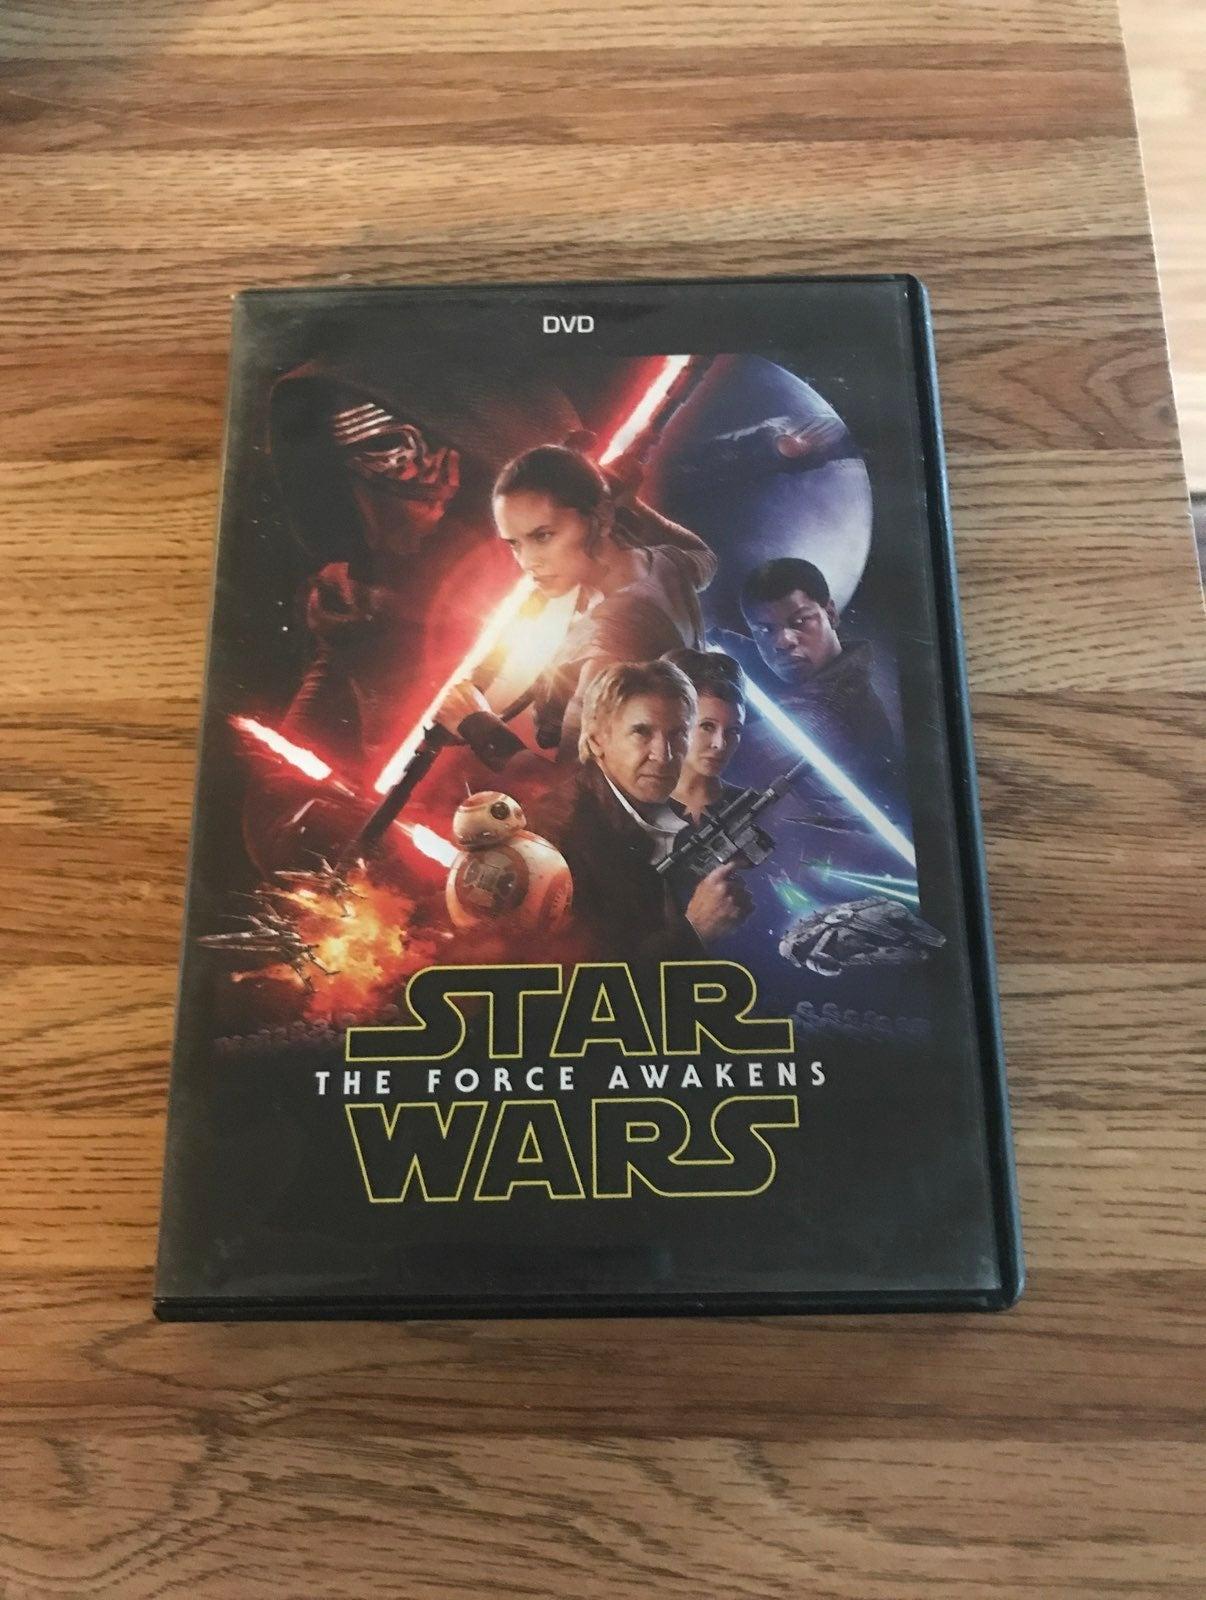 star wars the force awakens dvd movie